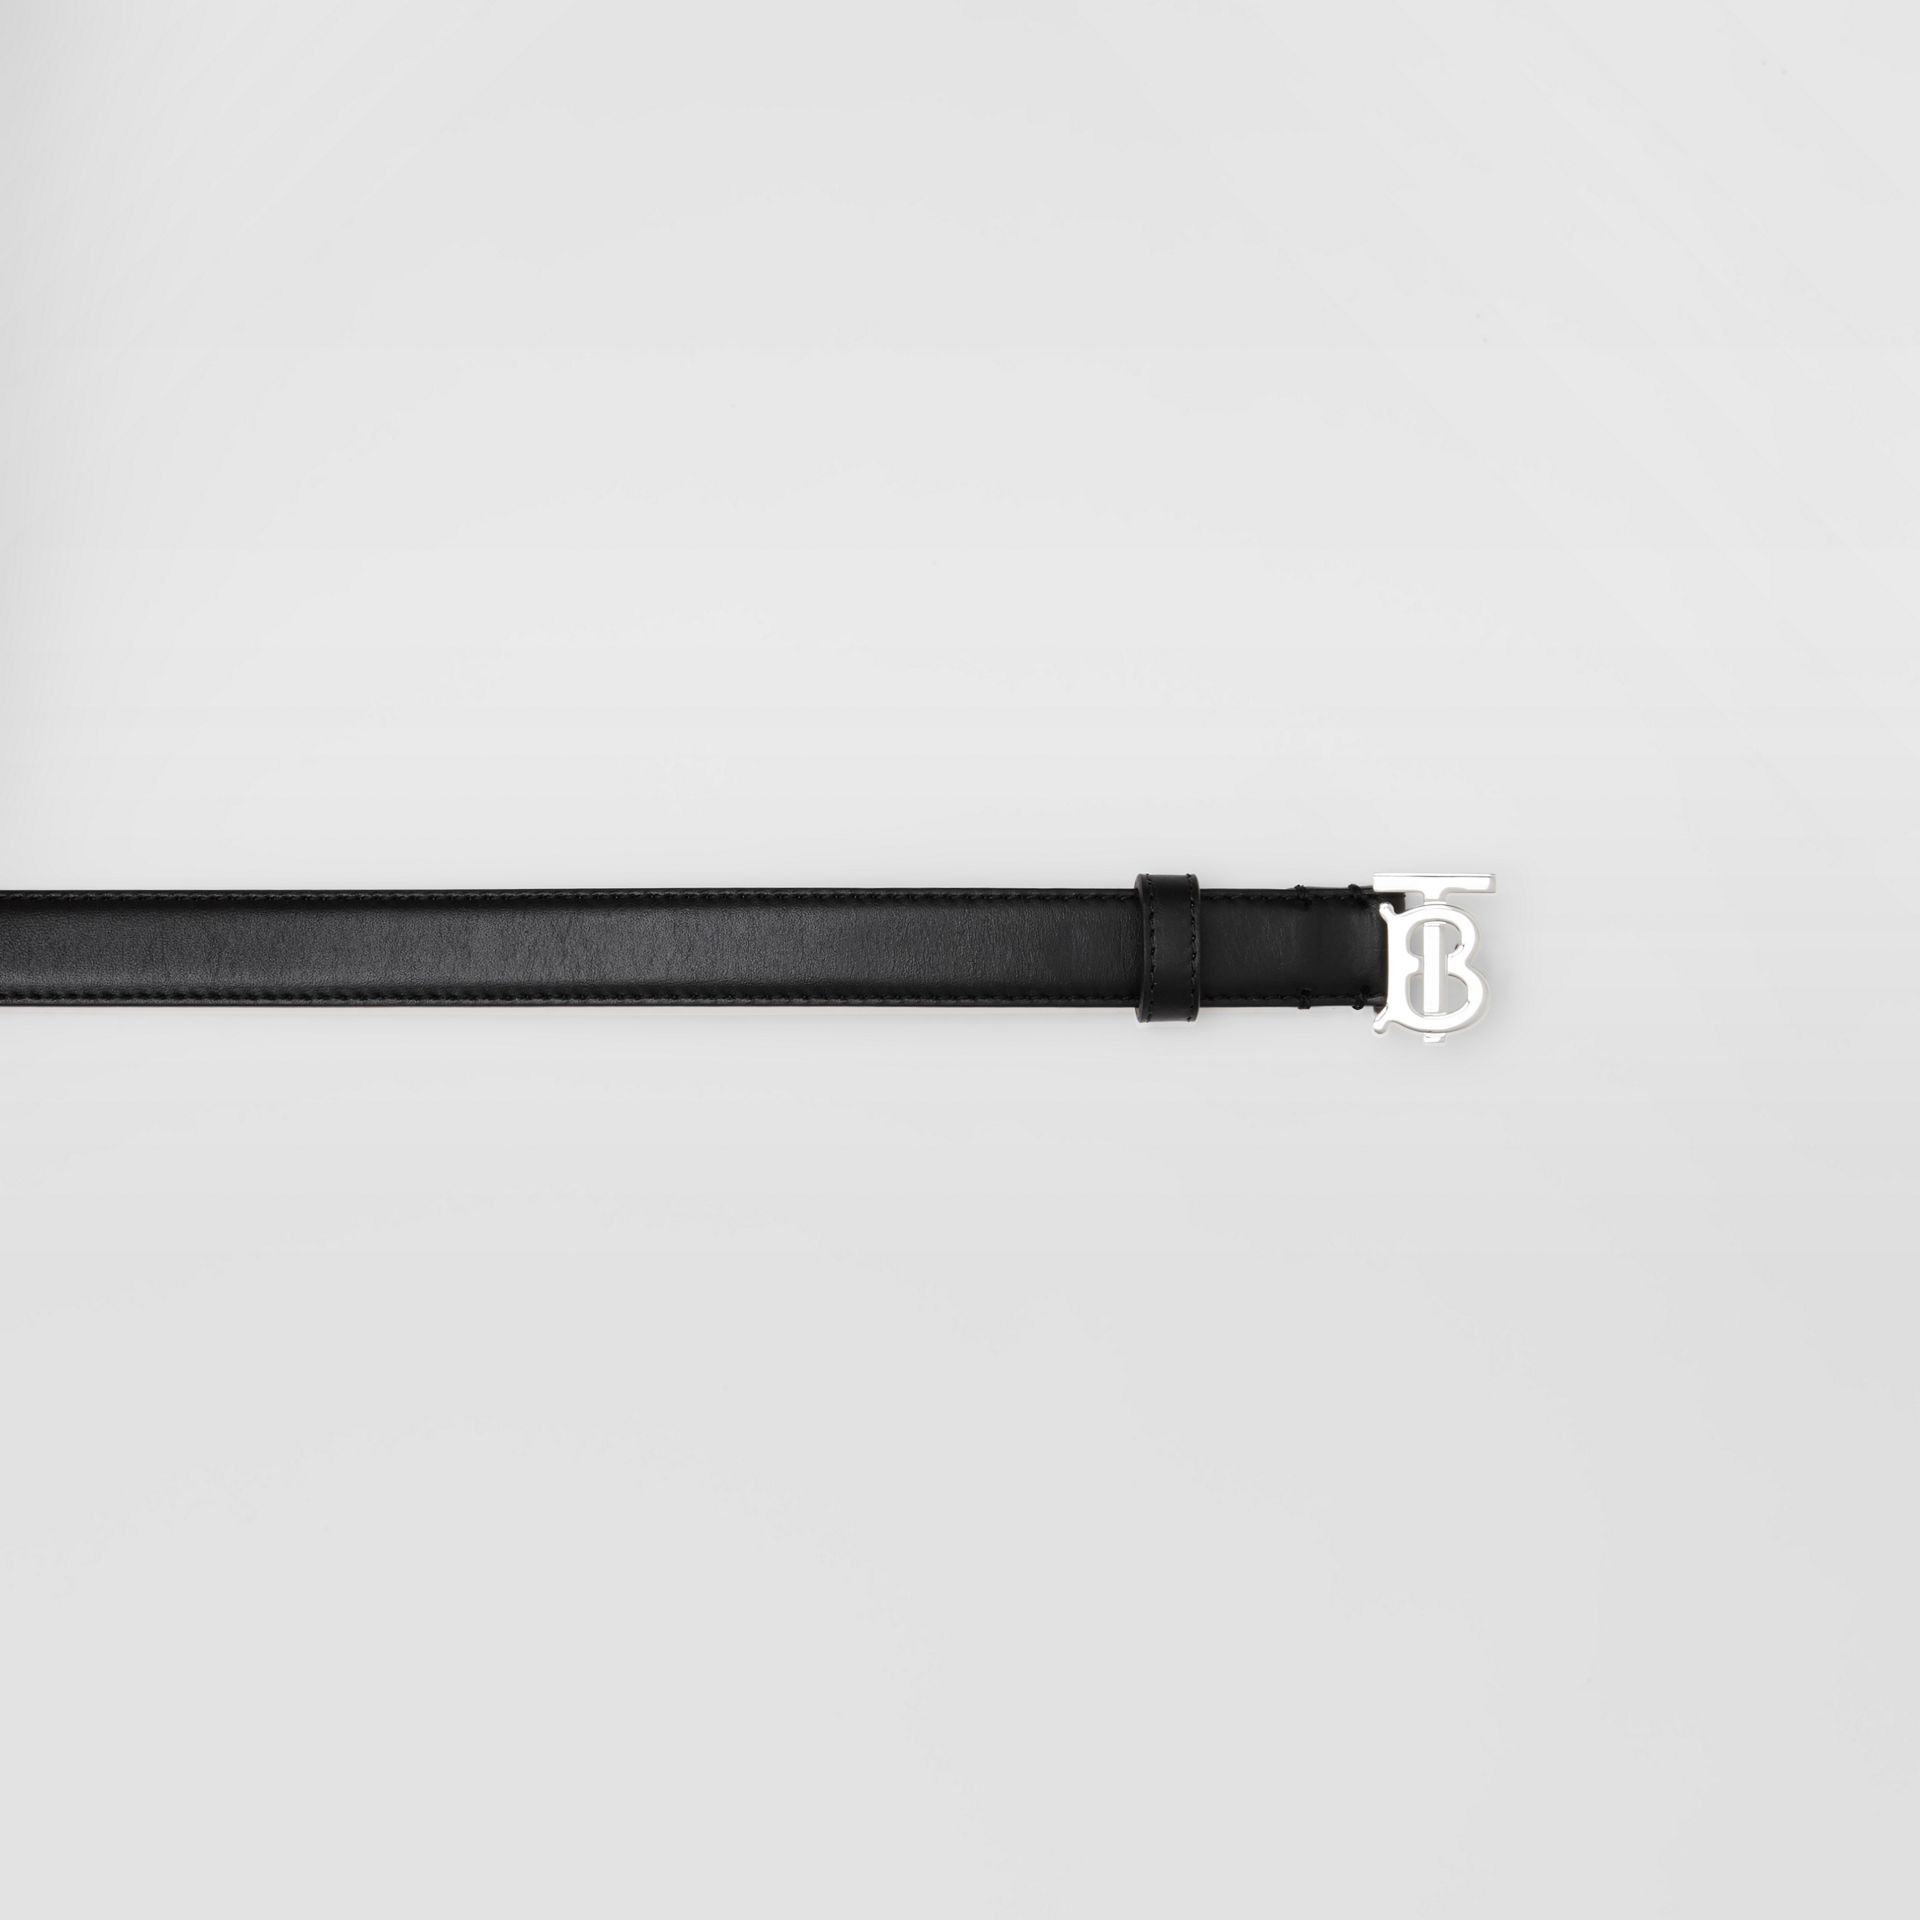 Monogram Motif Leather Belt in Black/palladio - Women | Burberry Canada - gallery image 1